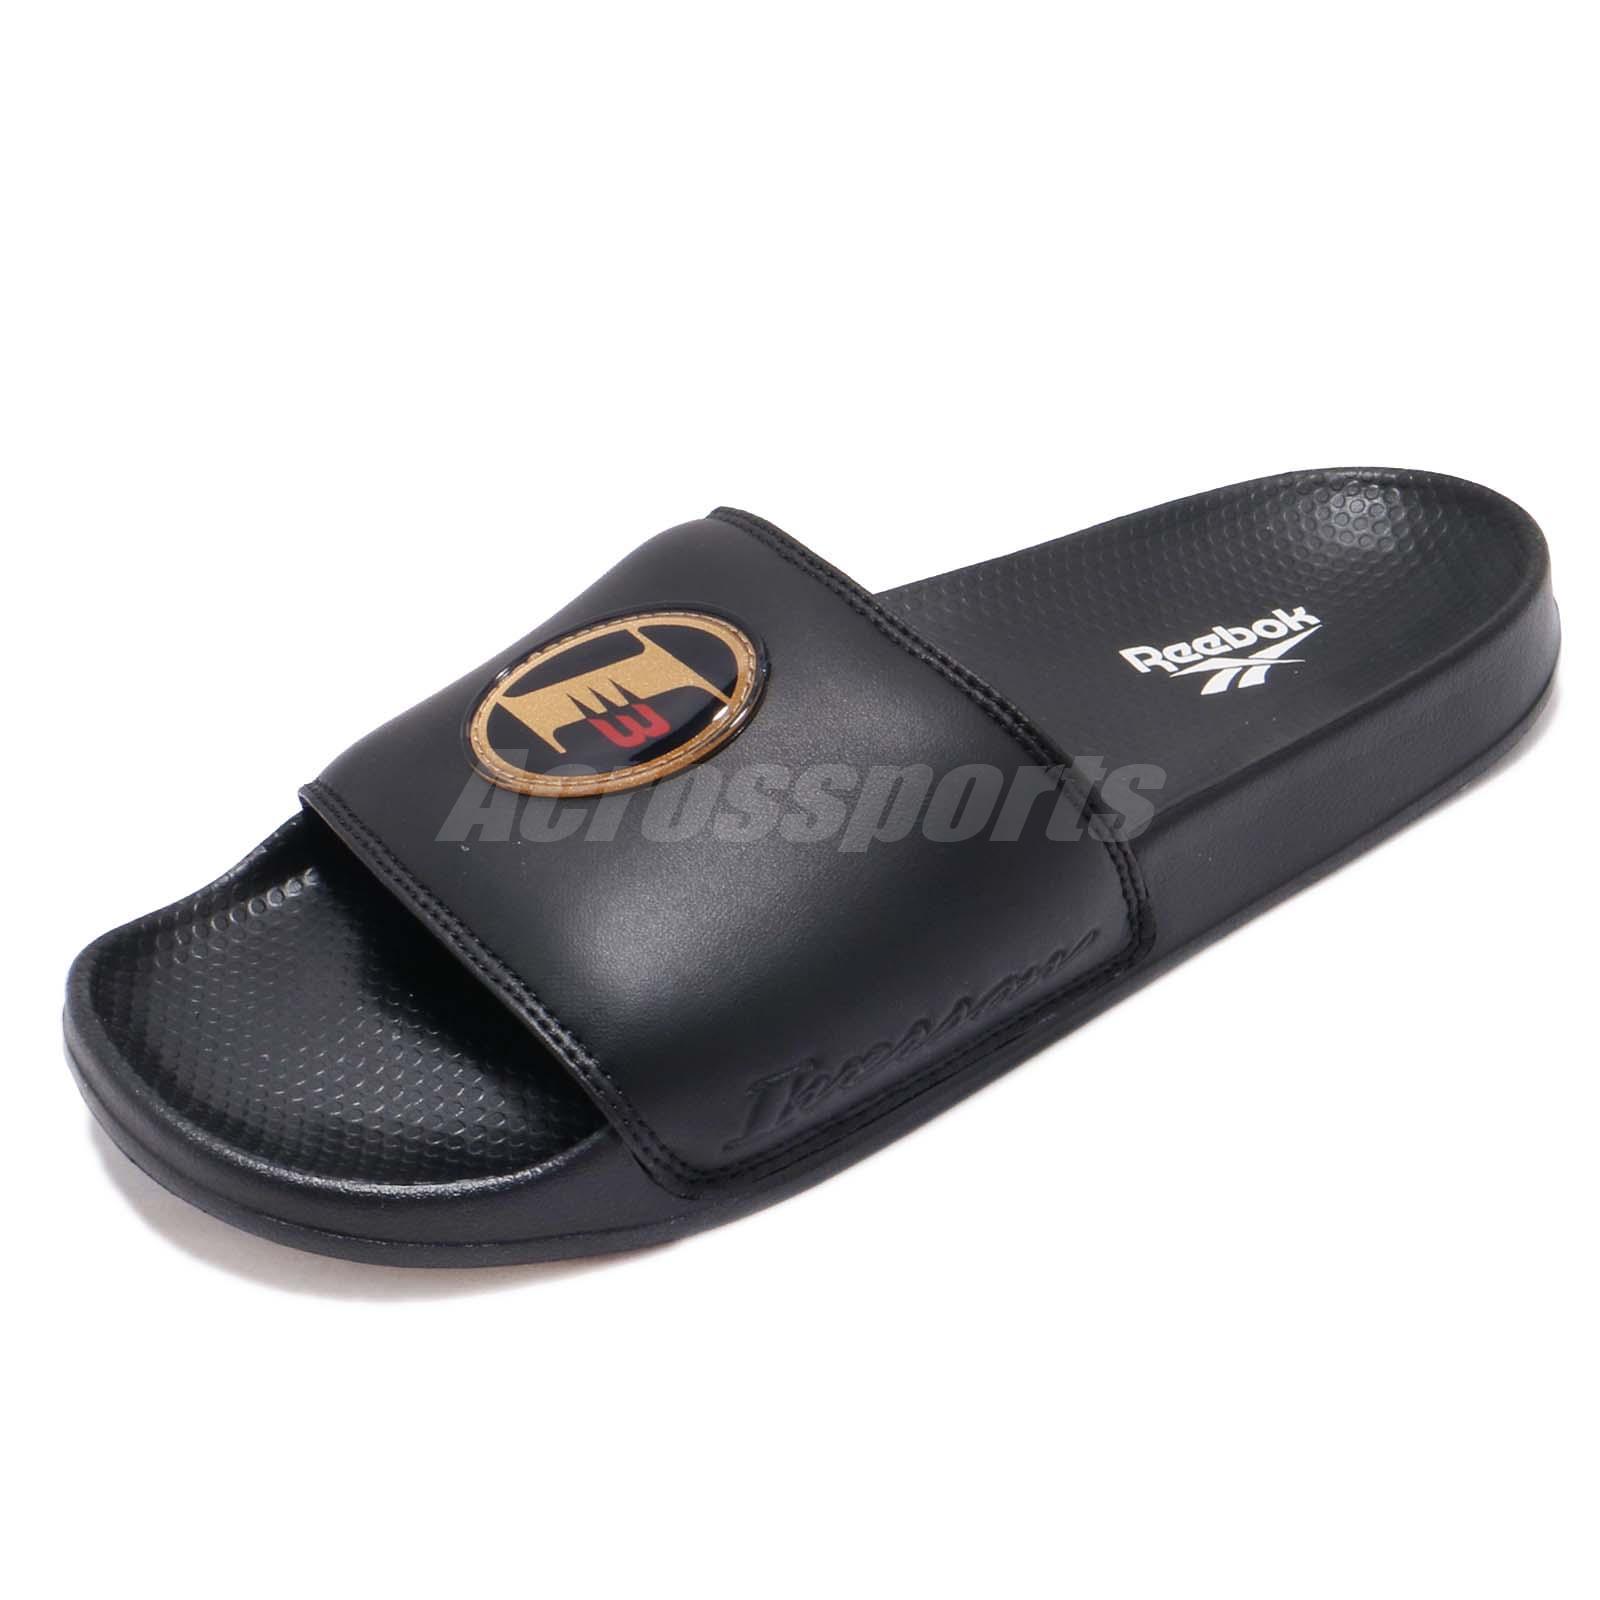 0f3571d39 Details about Reebok Classic Slide AI Allen Iverson I3 Black Men Sports Sandals  Slipper CN6737